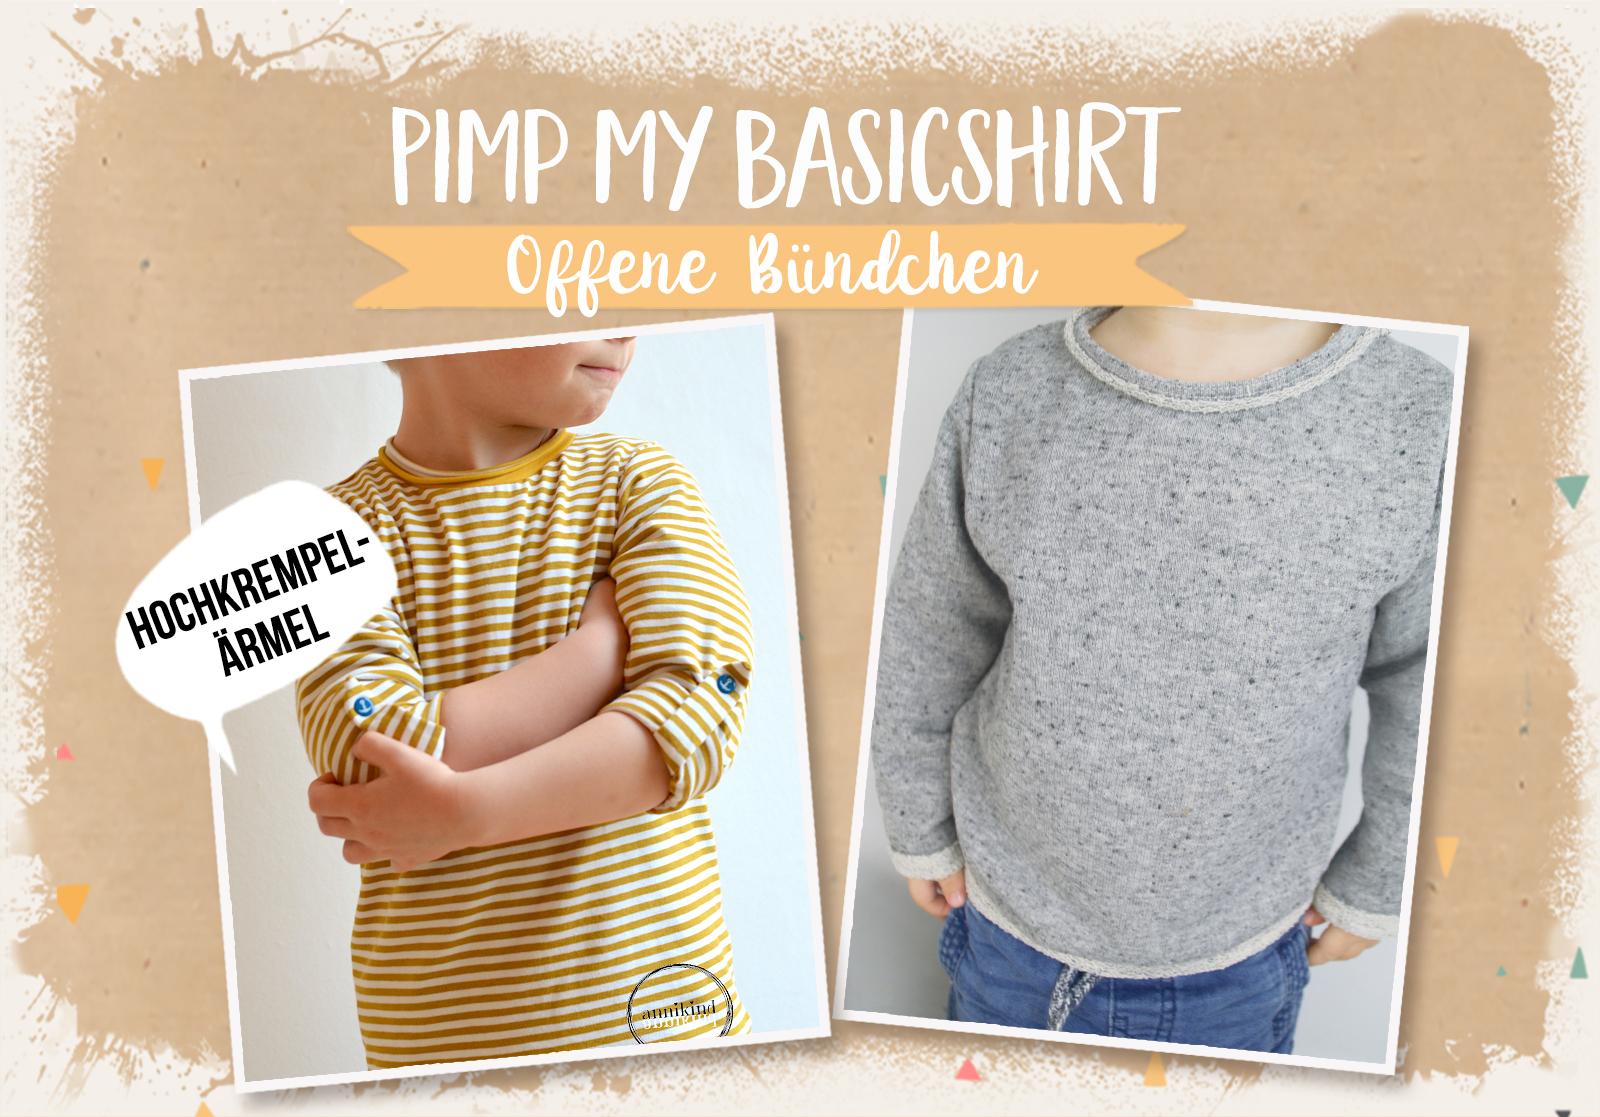 Pimp my Basicshirt 4/4: Offene Bündchen & Hochkrempel-Ärmel